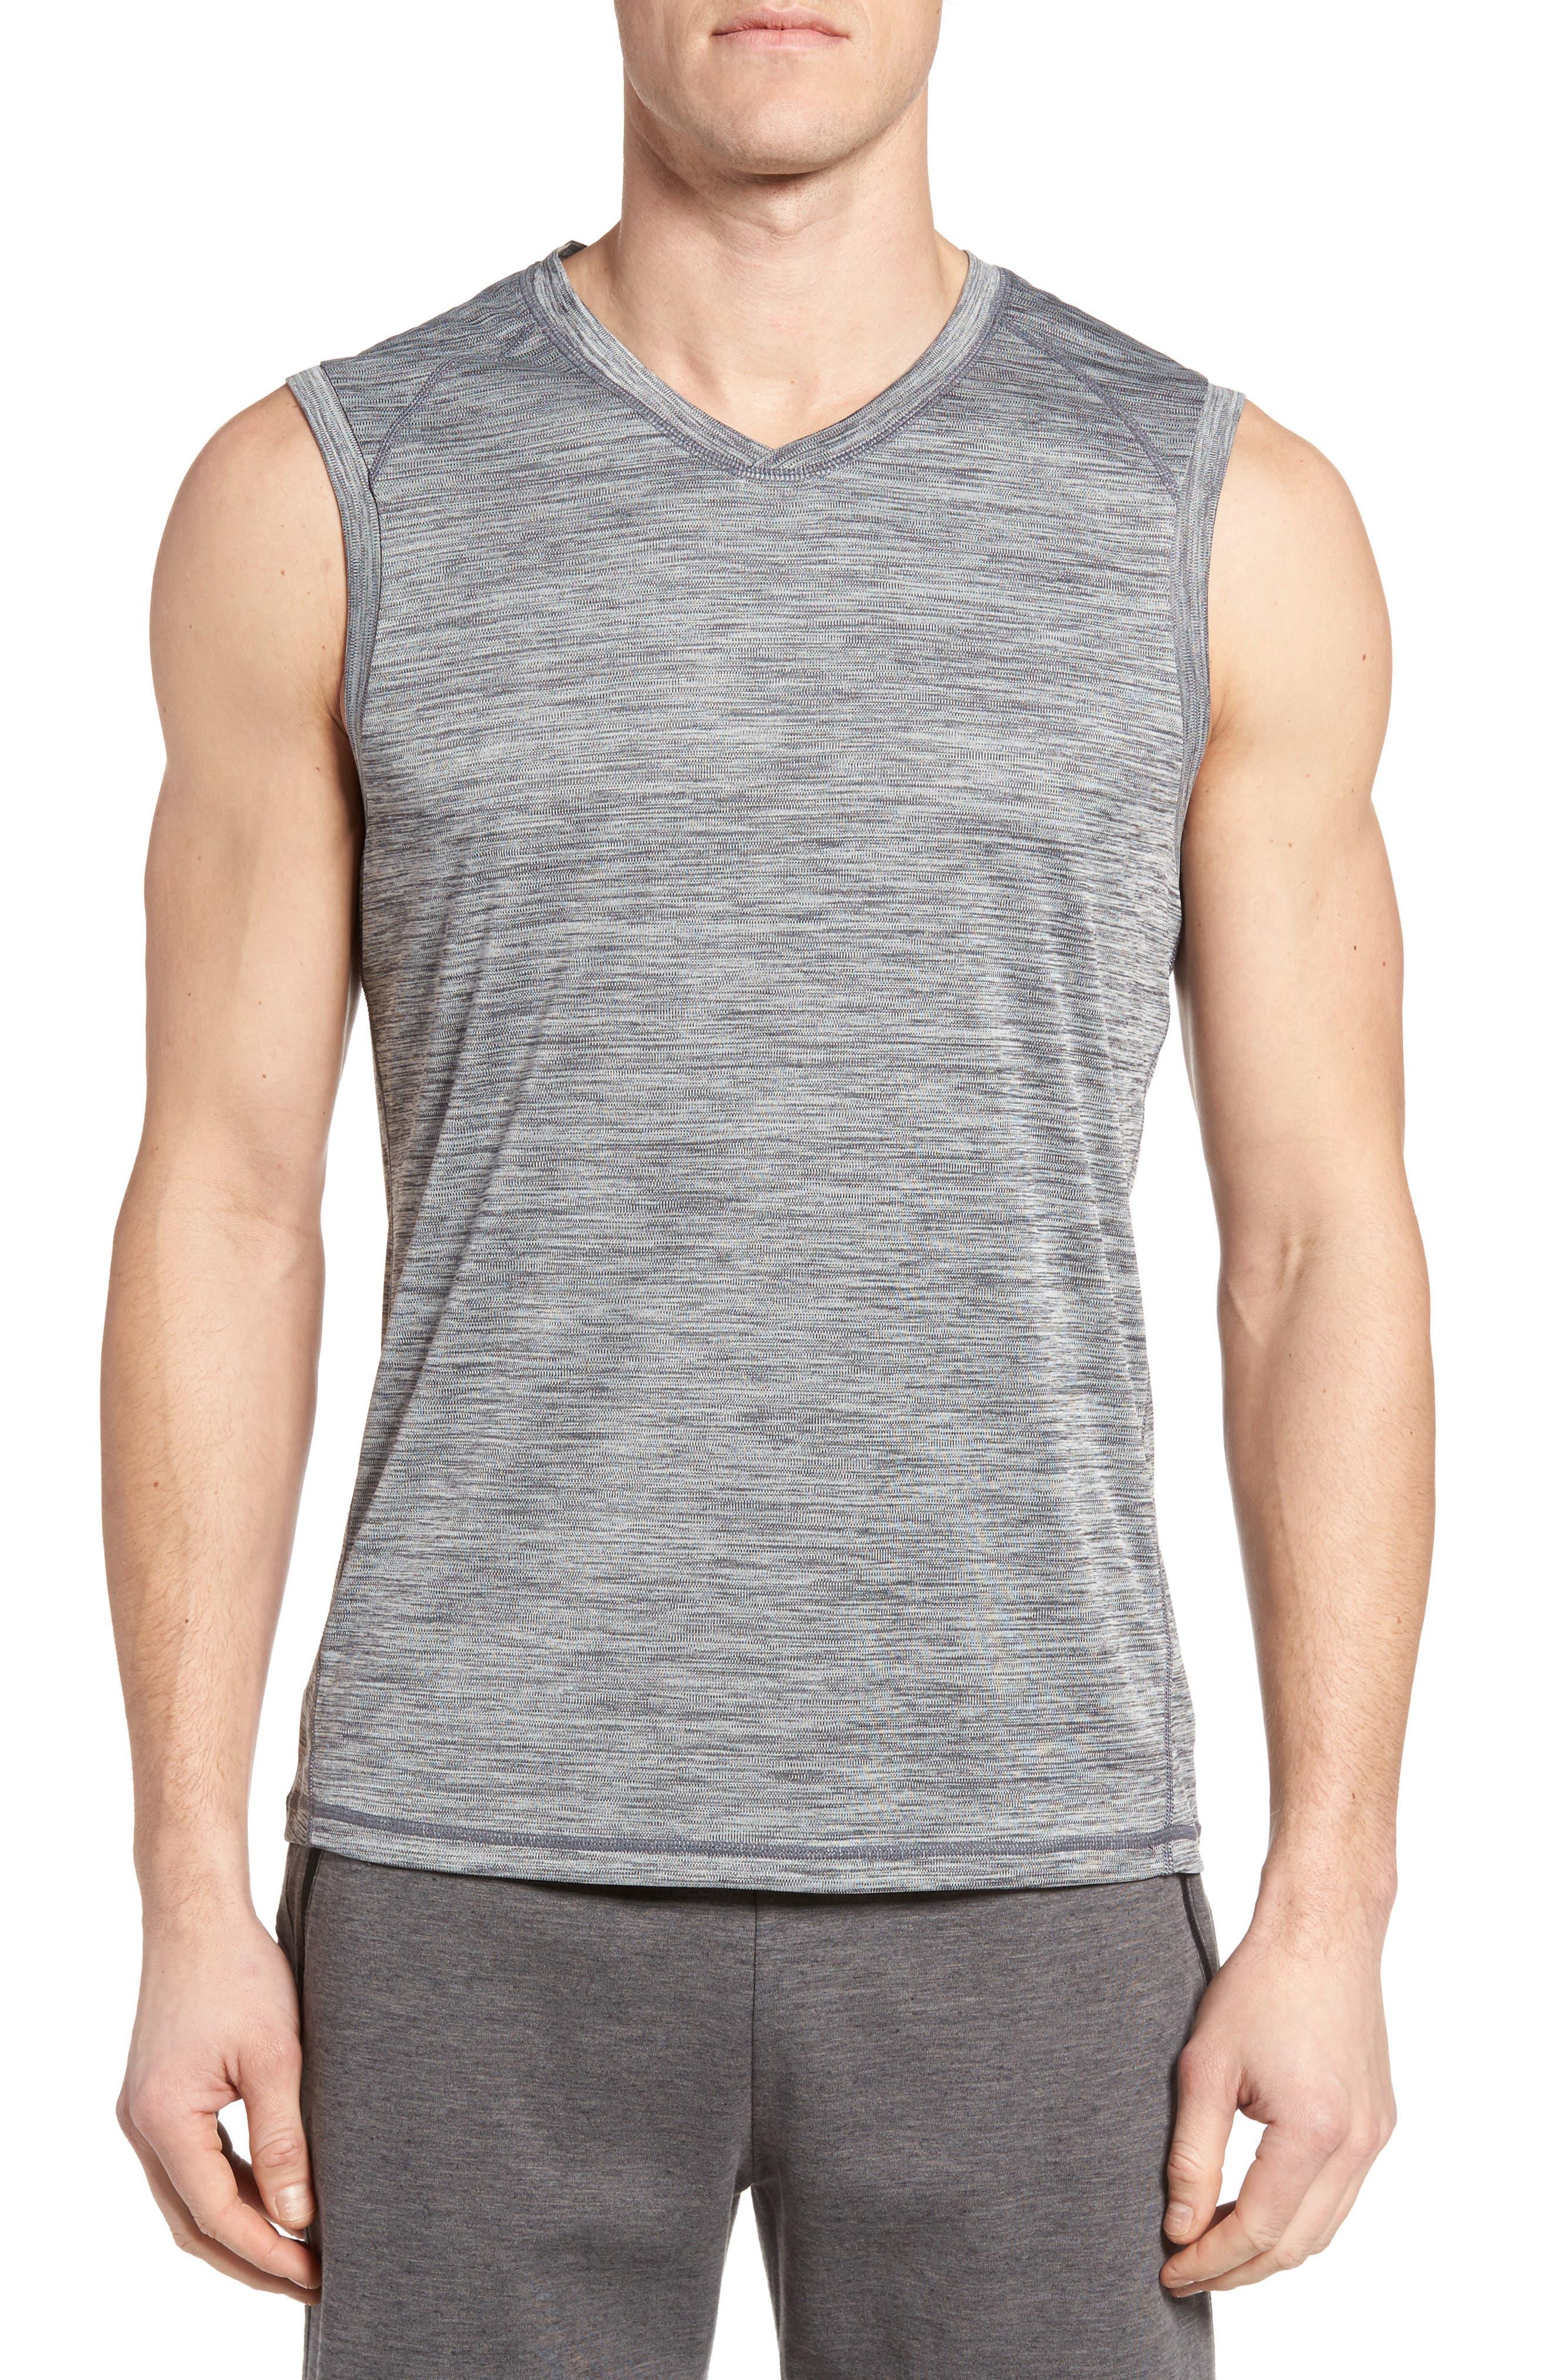 Main Image - Zella Triplite Muscle T-Shirt